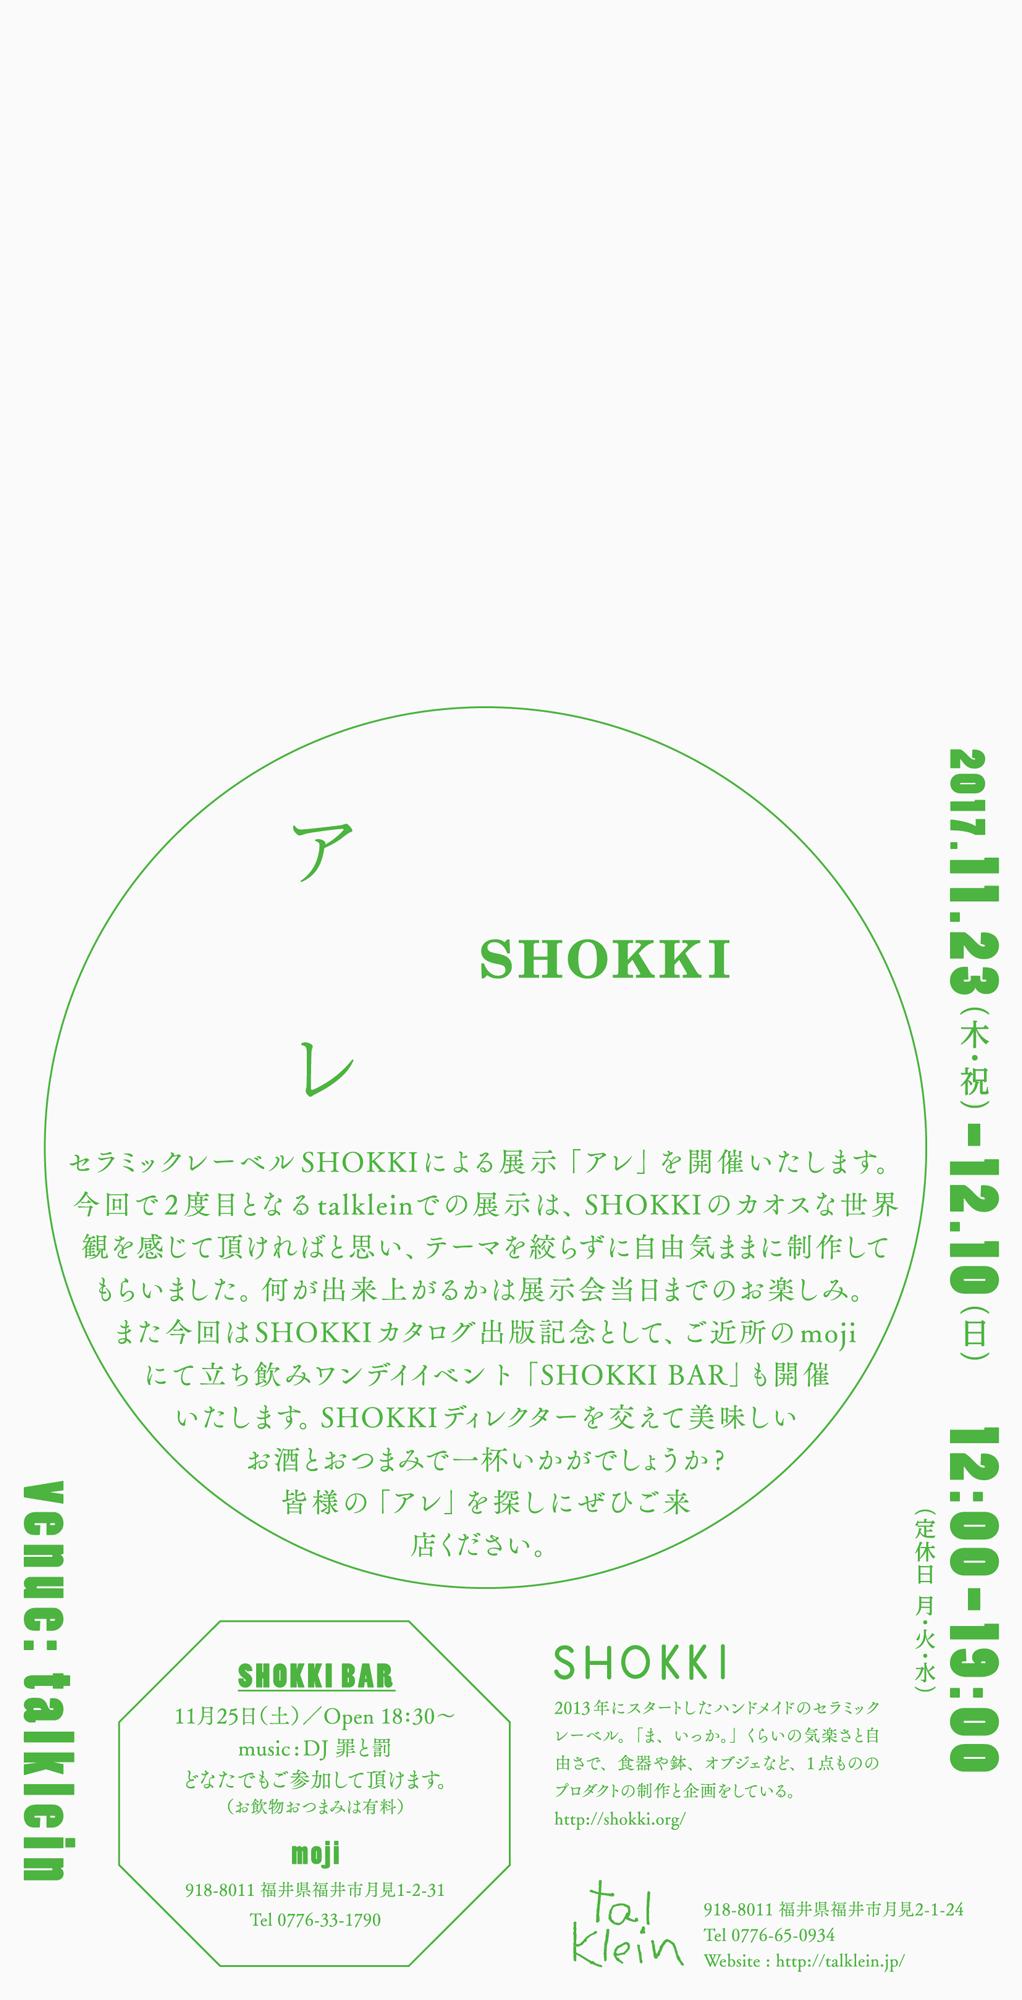 SHOKKI_アレ_DM_裏_告知用